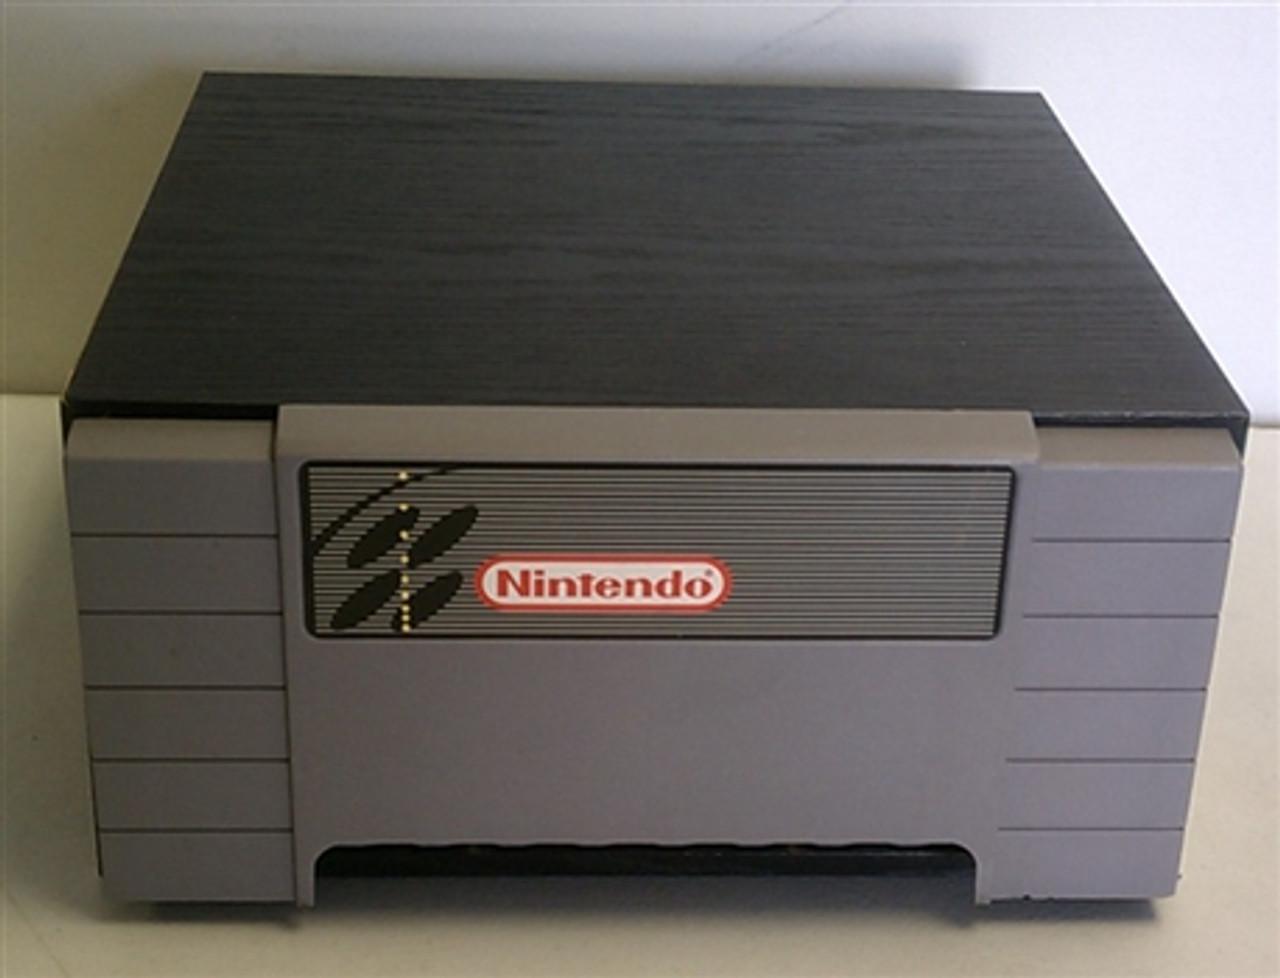 Storage Drawer - Holds 24 Super Nintendo SNES Games